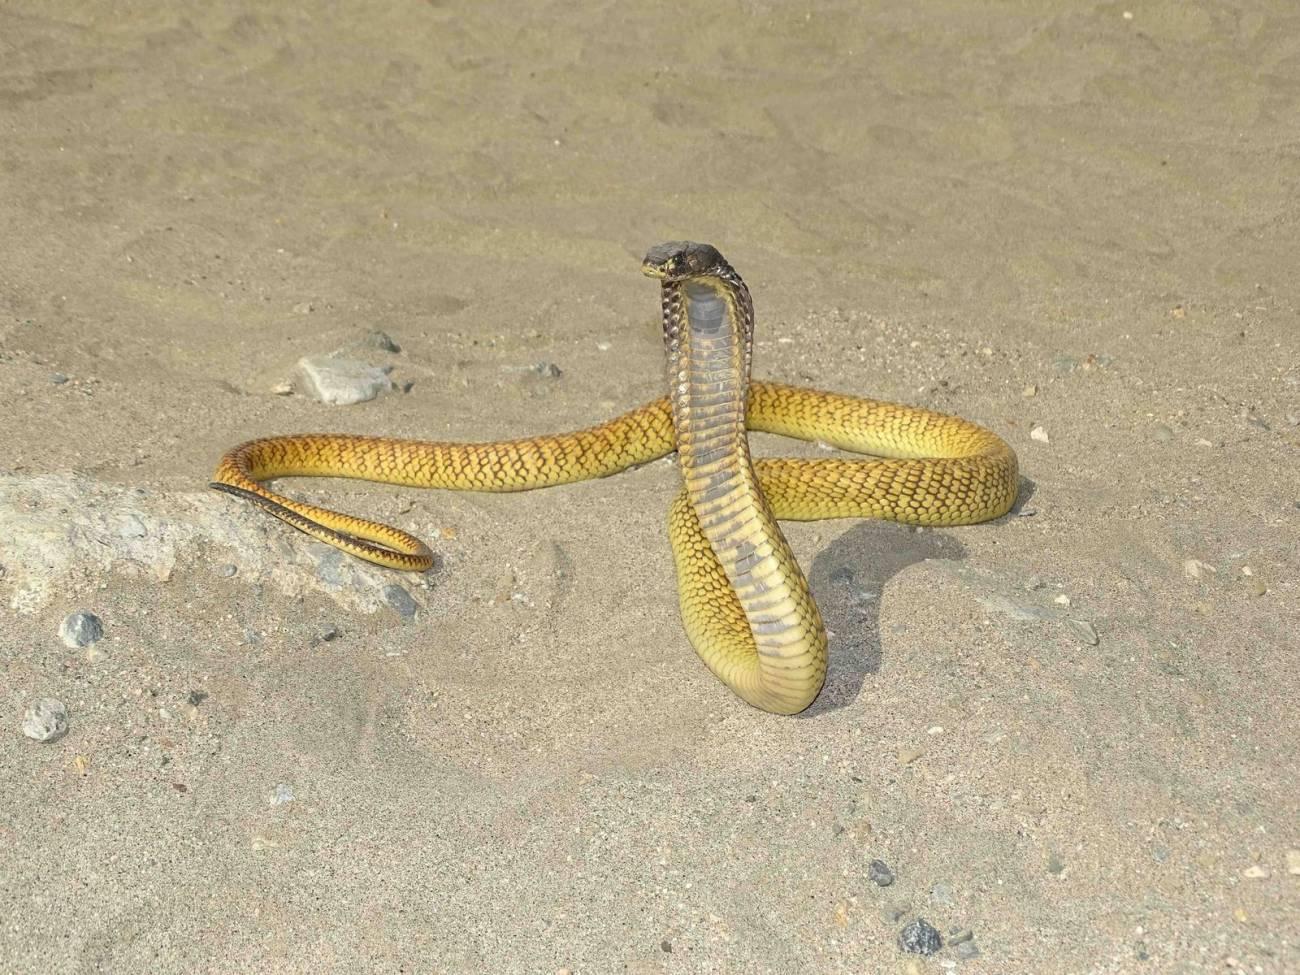 Imagen de Naja arabica, cobra endémica de Arabia Saudita, que se separó por vicarianza de su especie hermana Naja haje de África./  Salvador Carranza